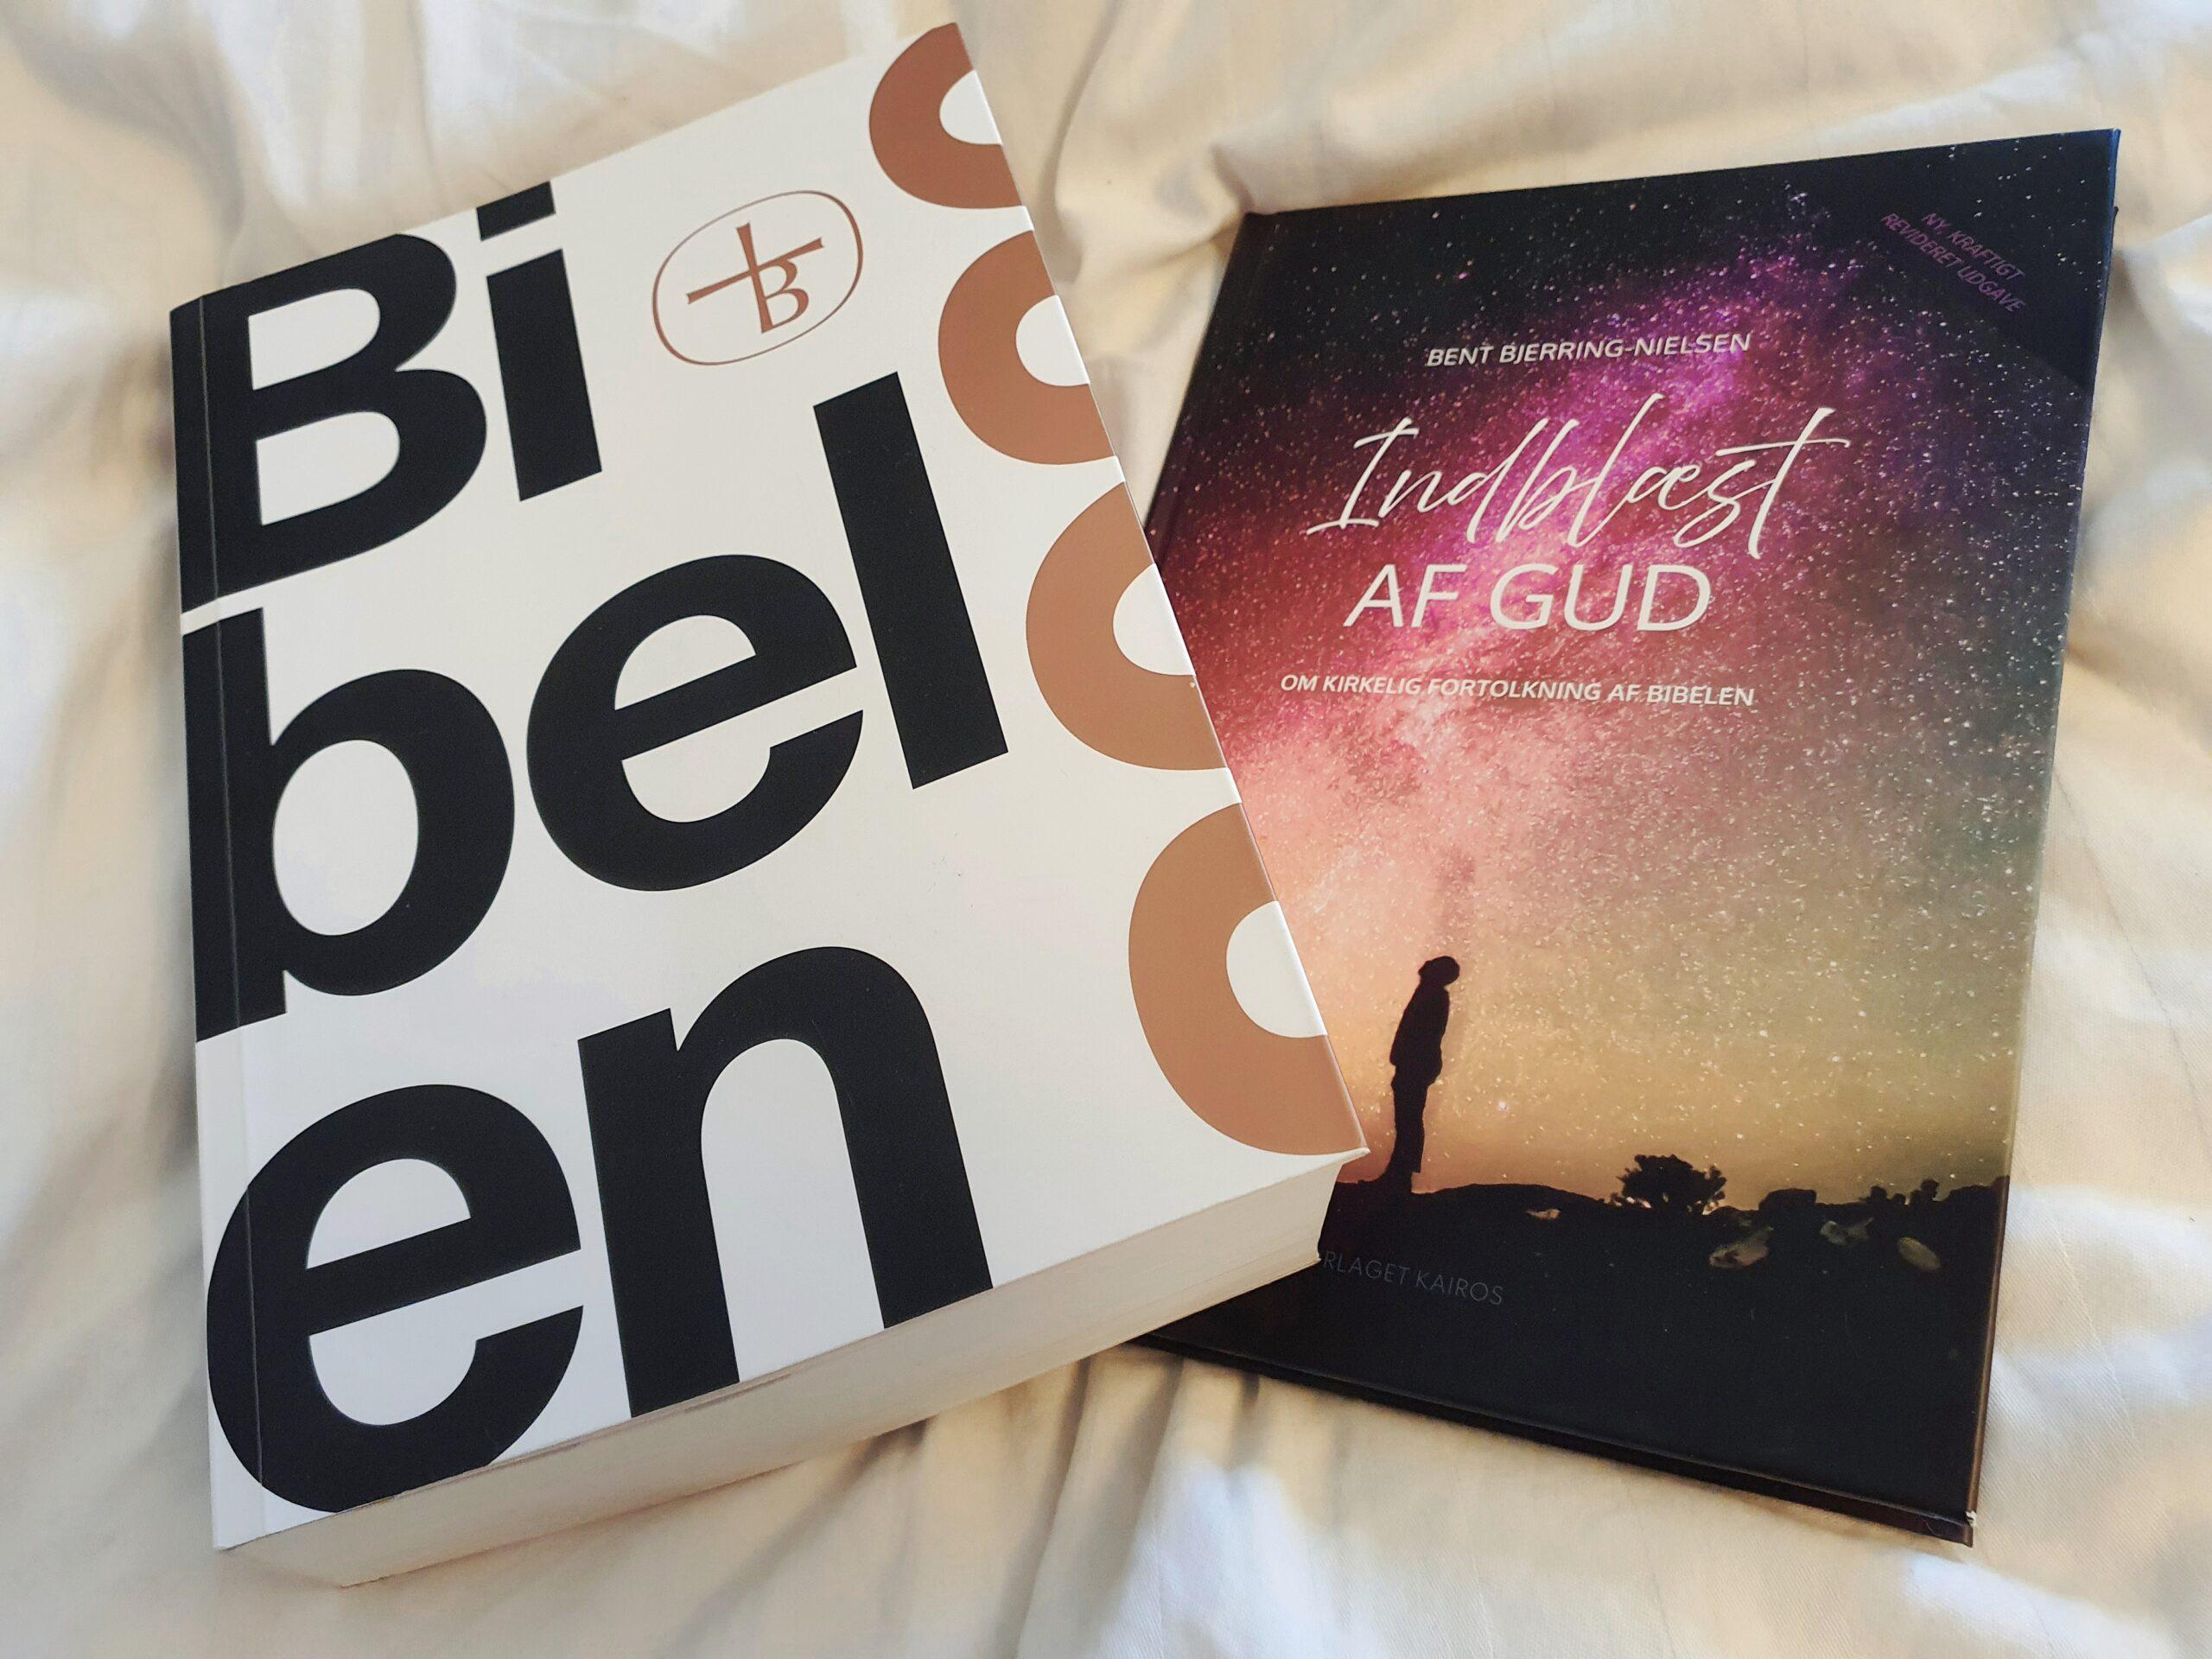 Online bibelskole med Bent Bjerring-Nielsen